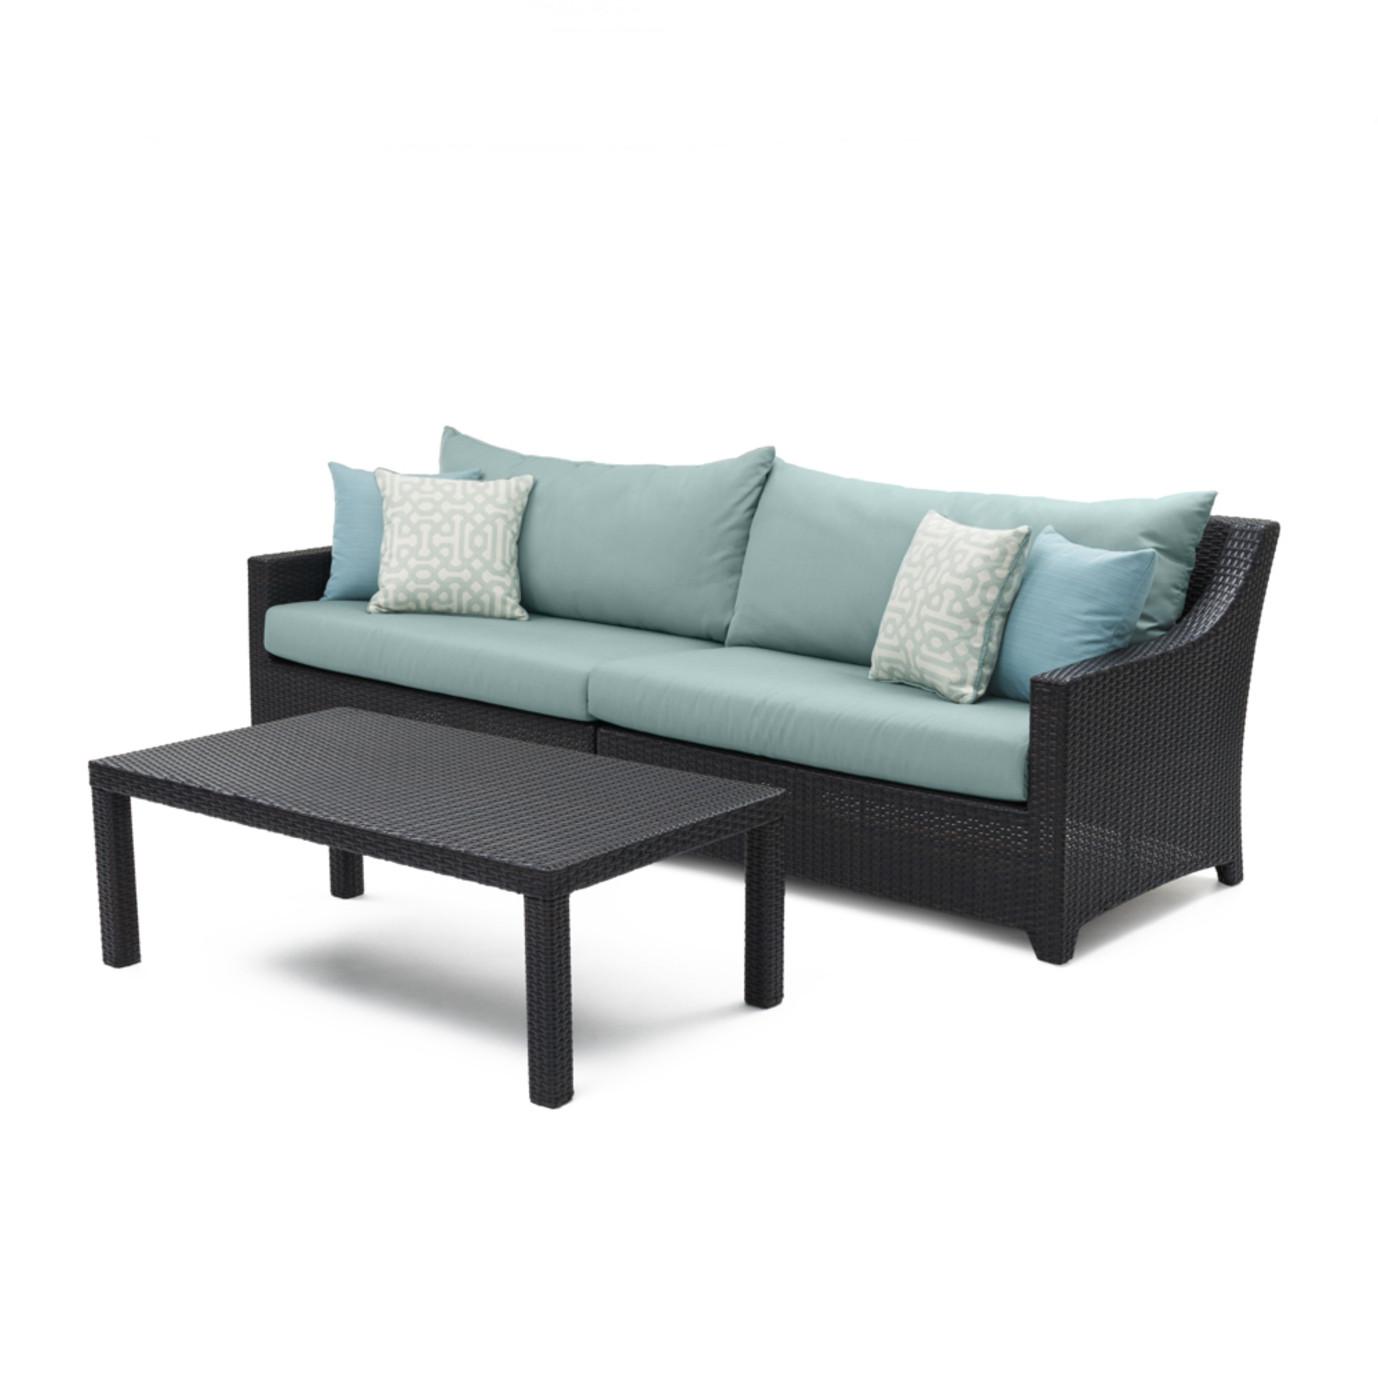 Deco™ Sofa & Coffee Table - Spa Blue